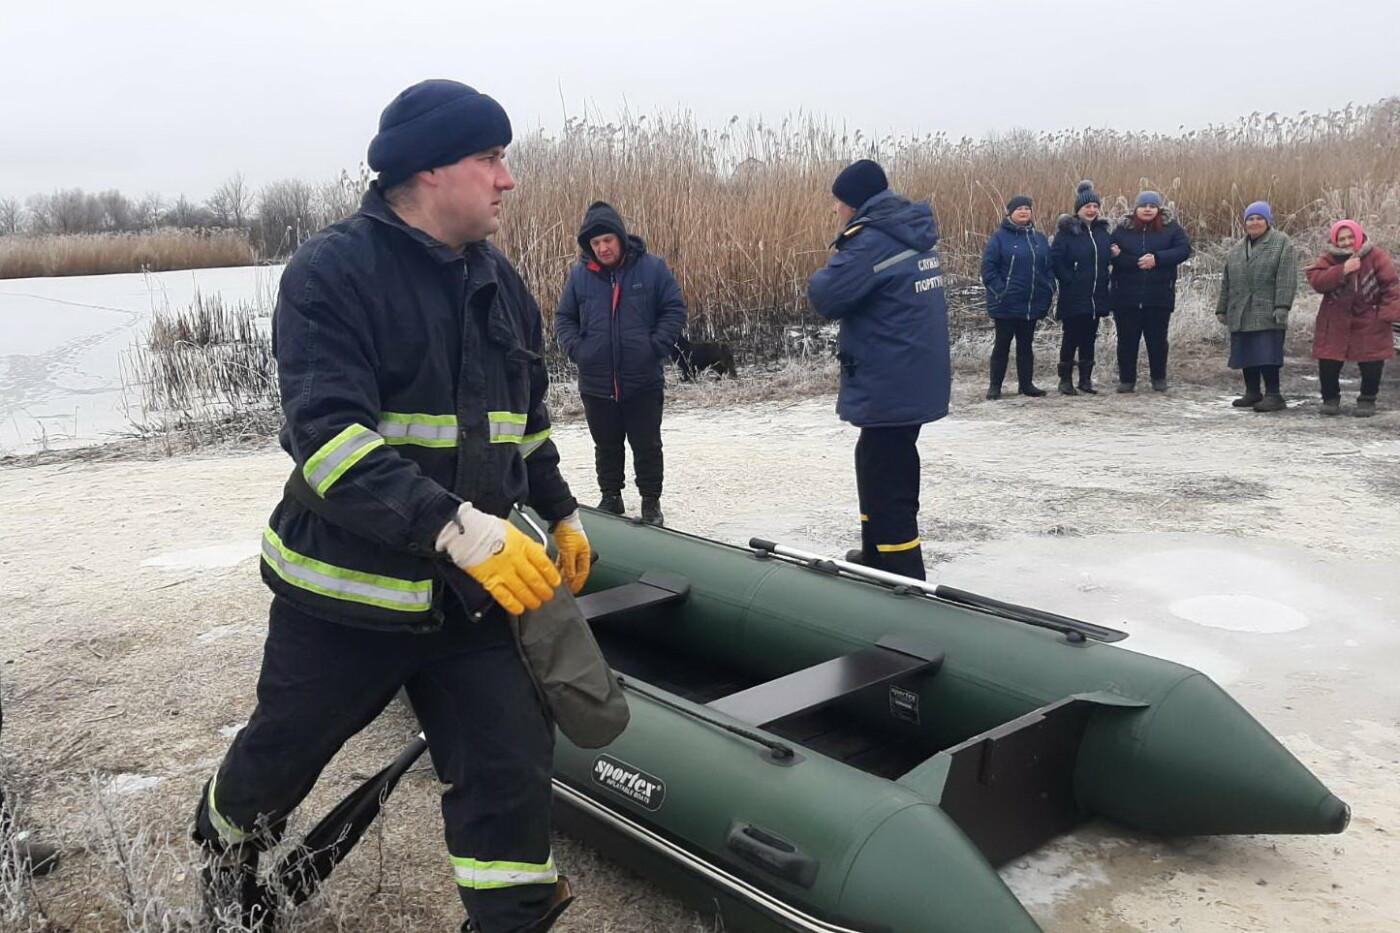 Провалился под лед на глазах у рыбаков: на Харьковщине в пруду захлебнулся мужчина, - ВИДЕО, ФОТО, фото-2